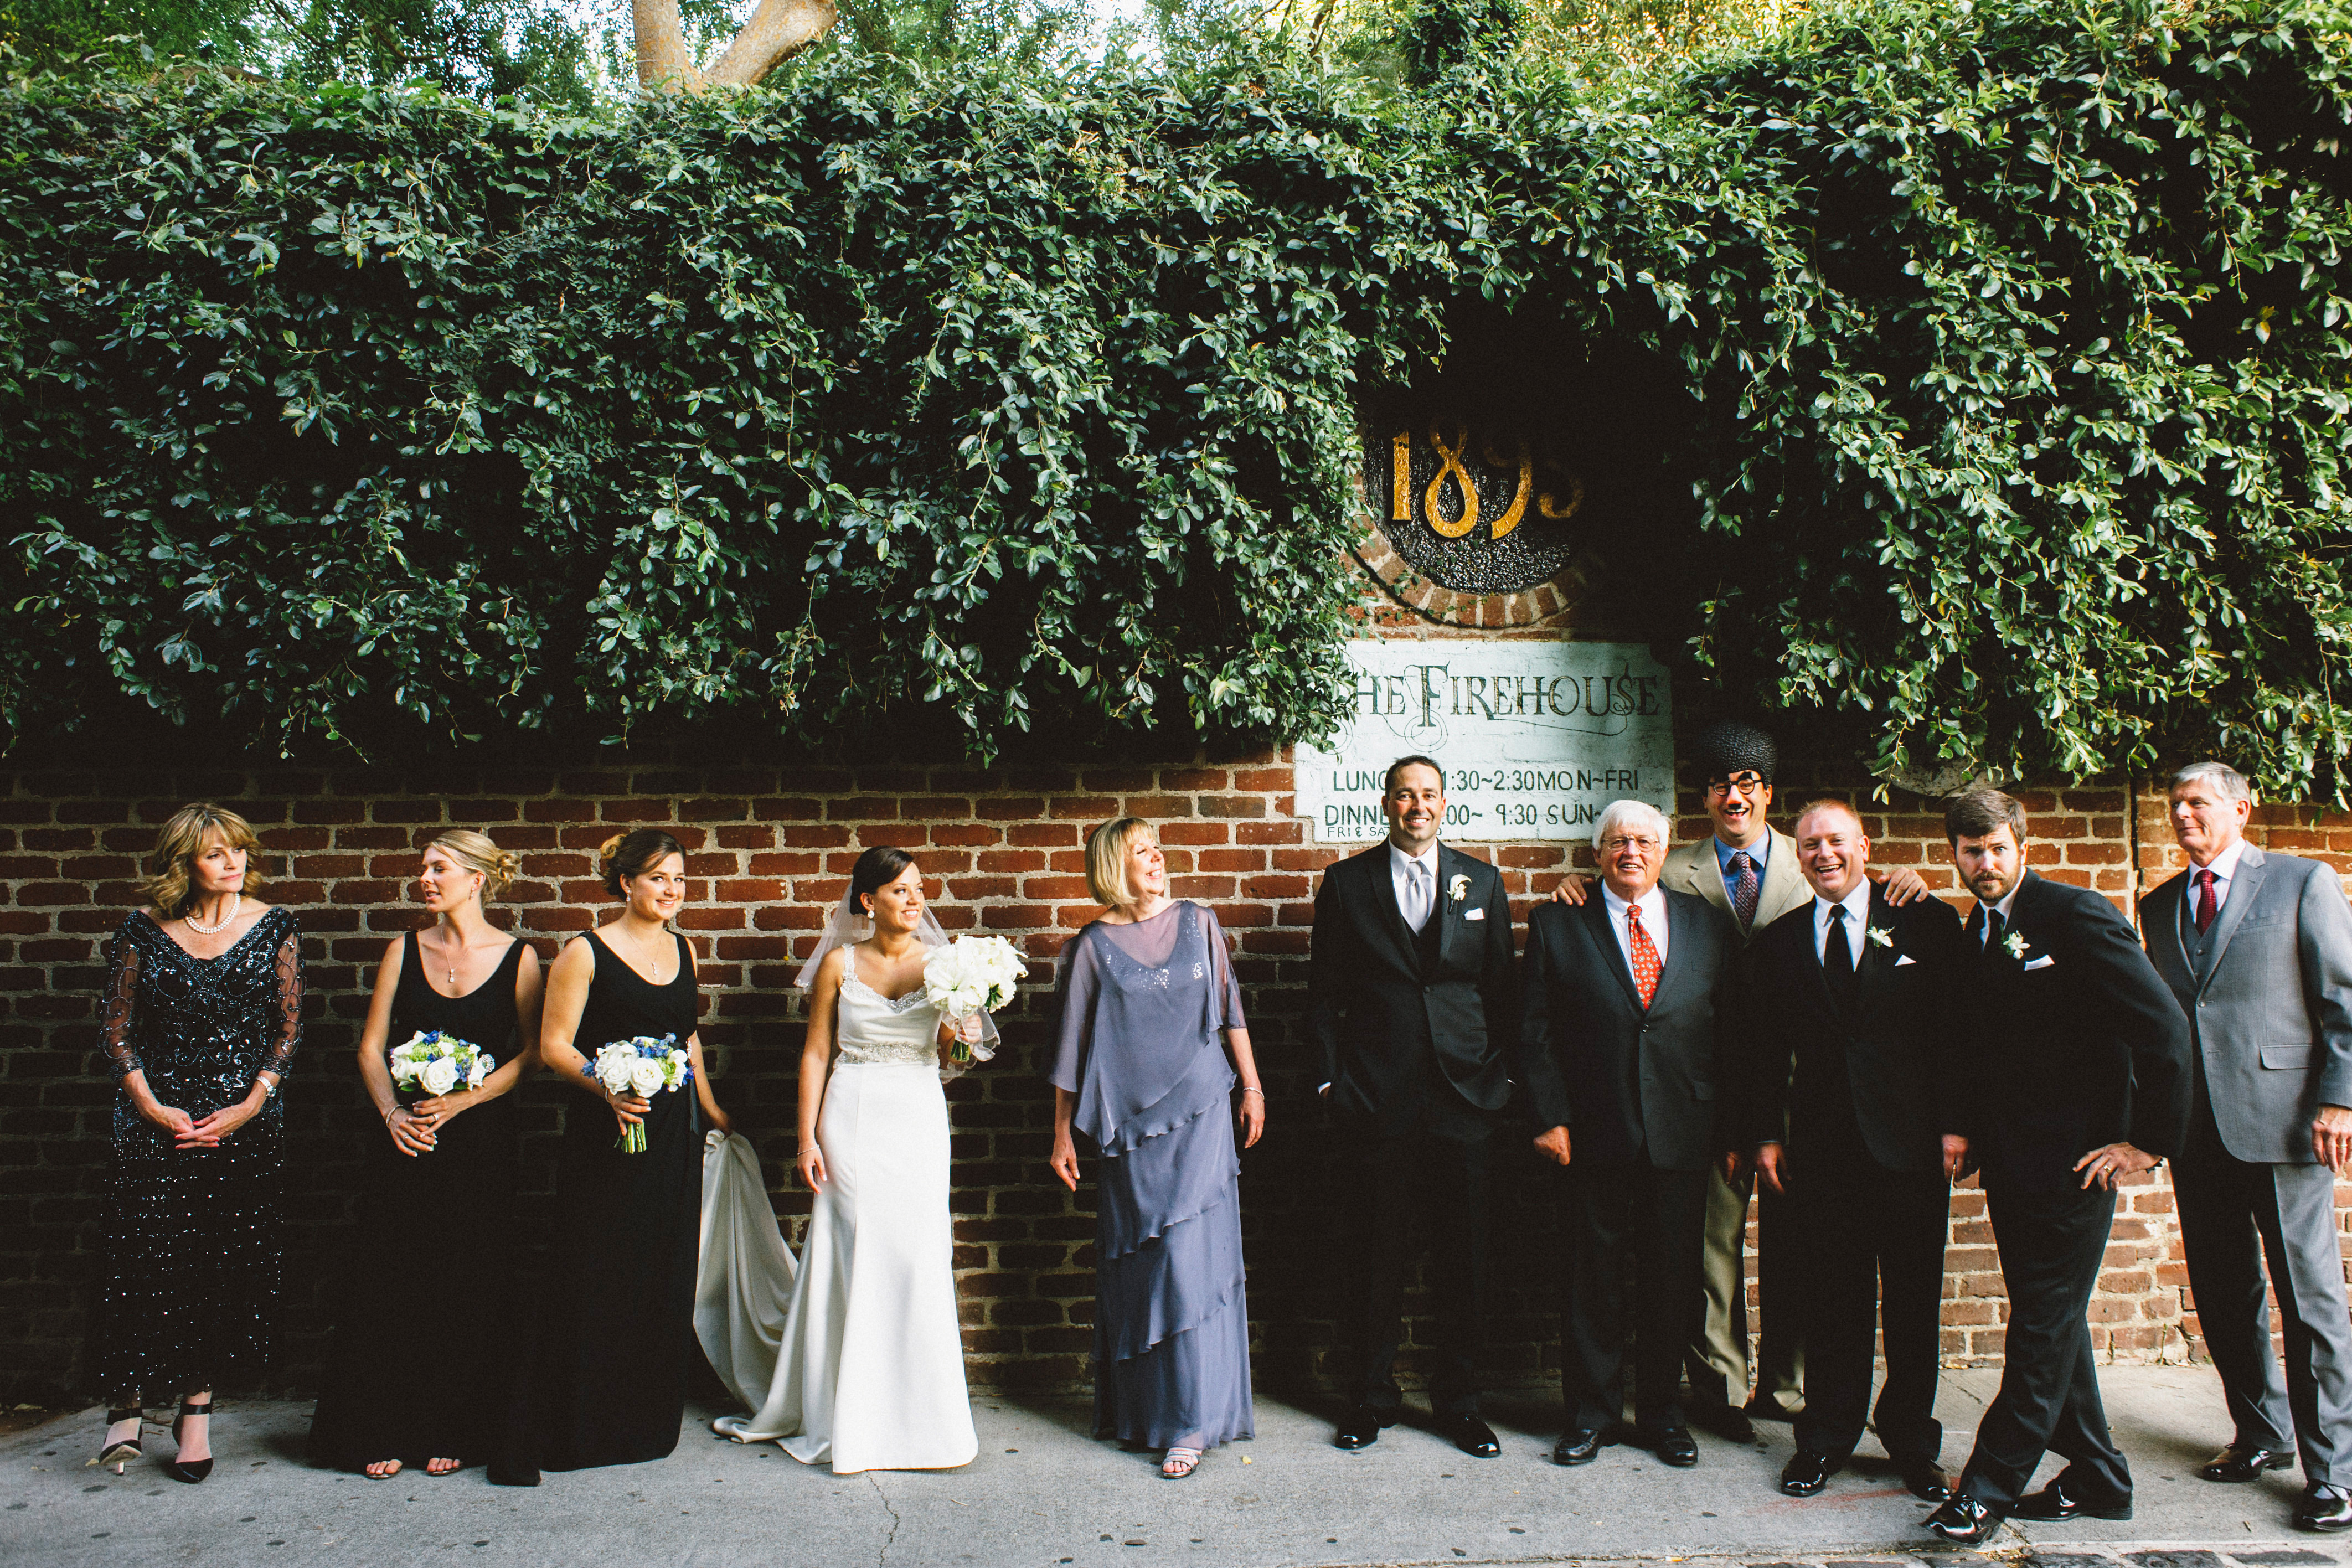 Photobombed family photo in the alley | Sacramento Firehouse Wedding